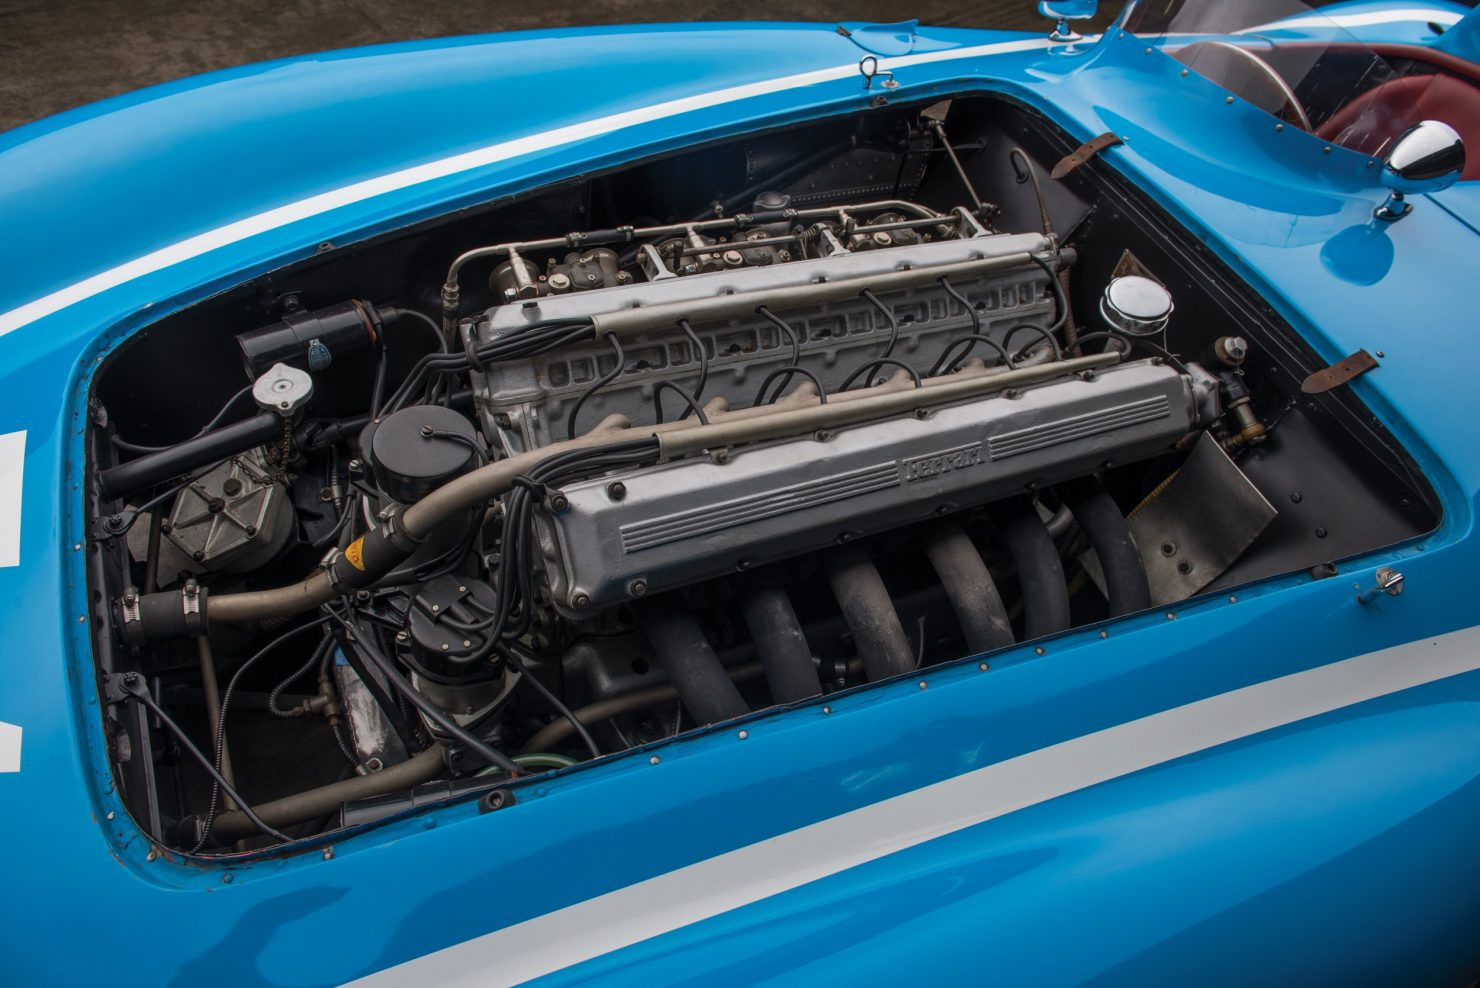 ferrari 121 lm spider 15 1480x988 - 1955 Ferrari 121 LM